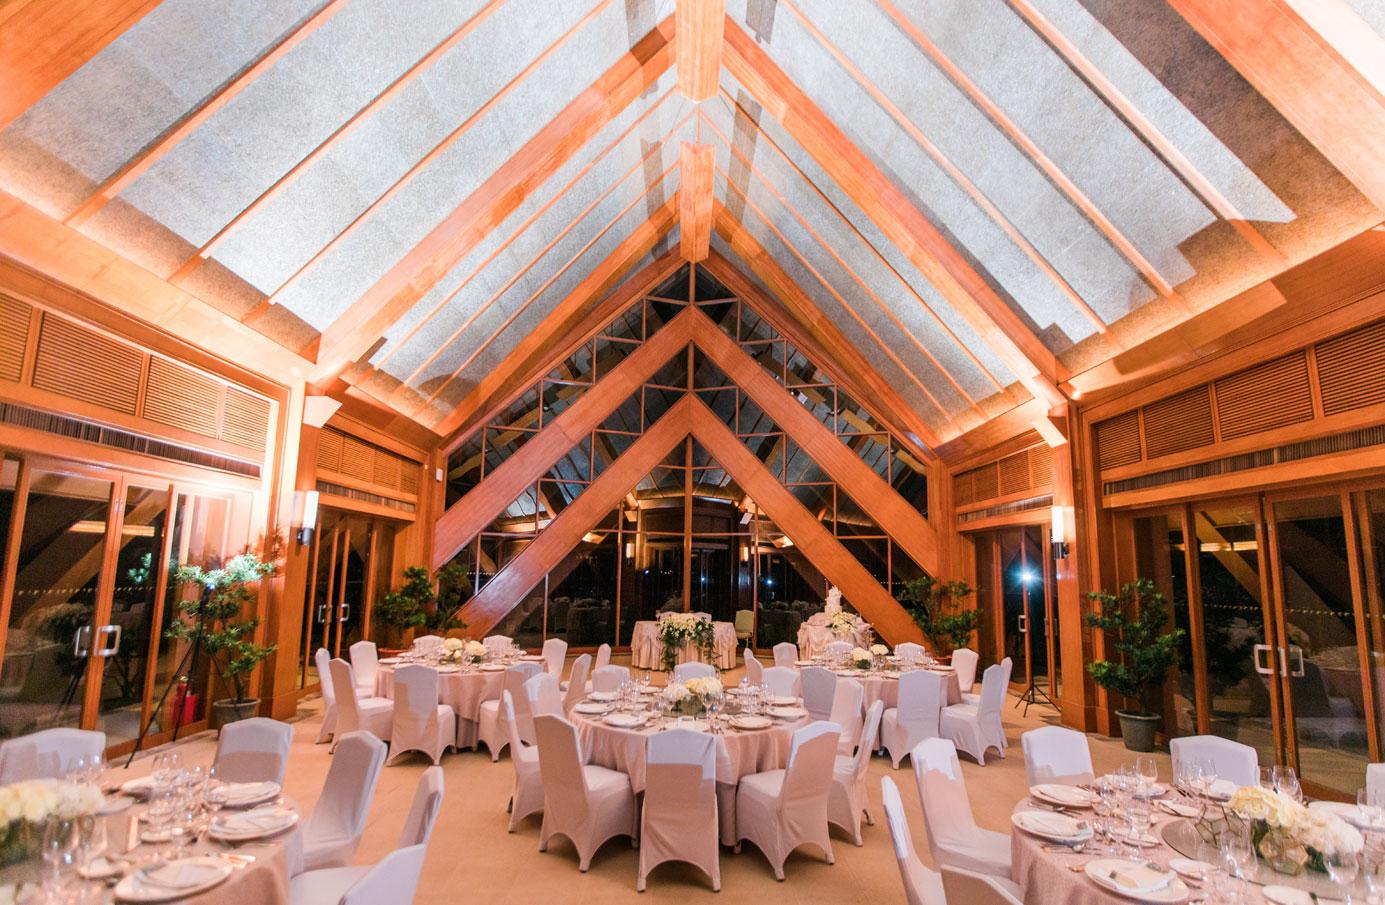 cebu-wedding-party-shangrila (2)